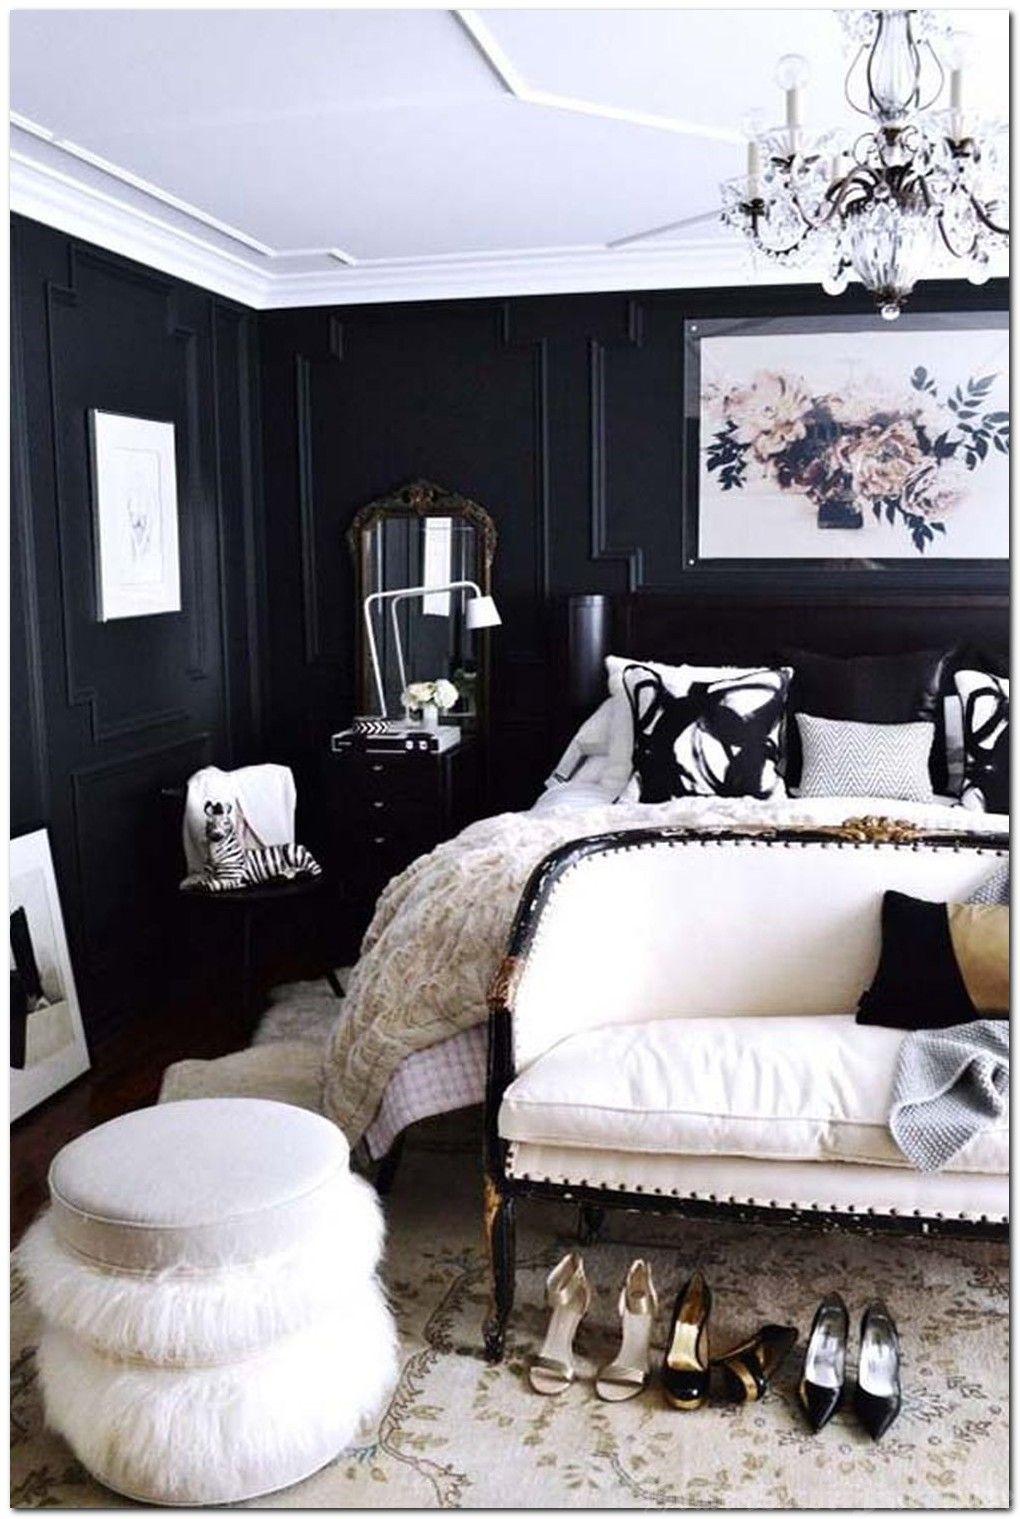 10 Factors That Affect Furniture Home Decor